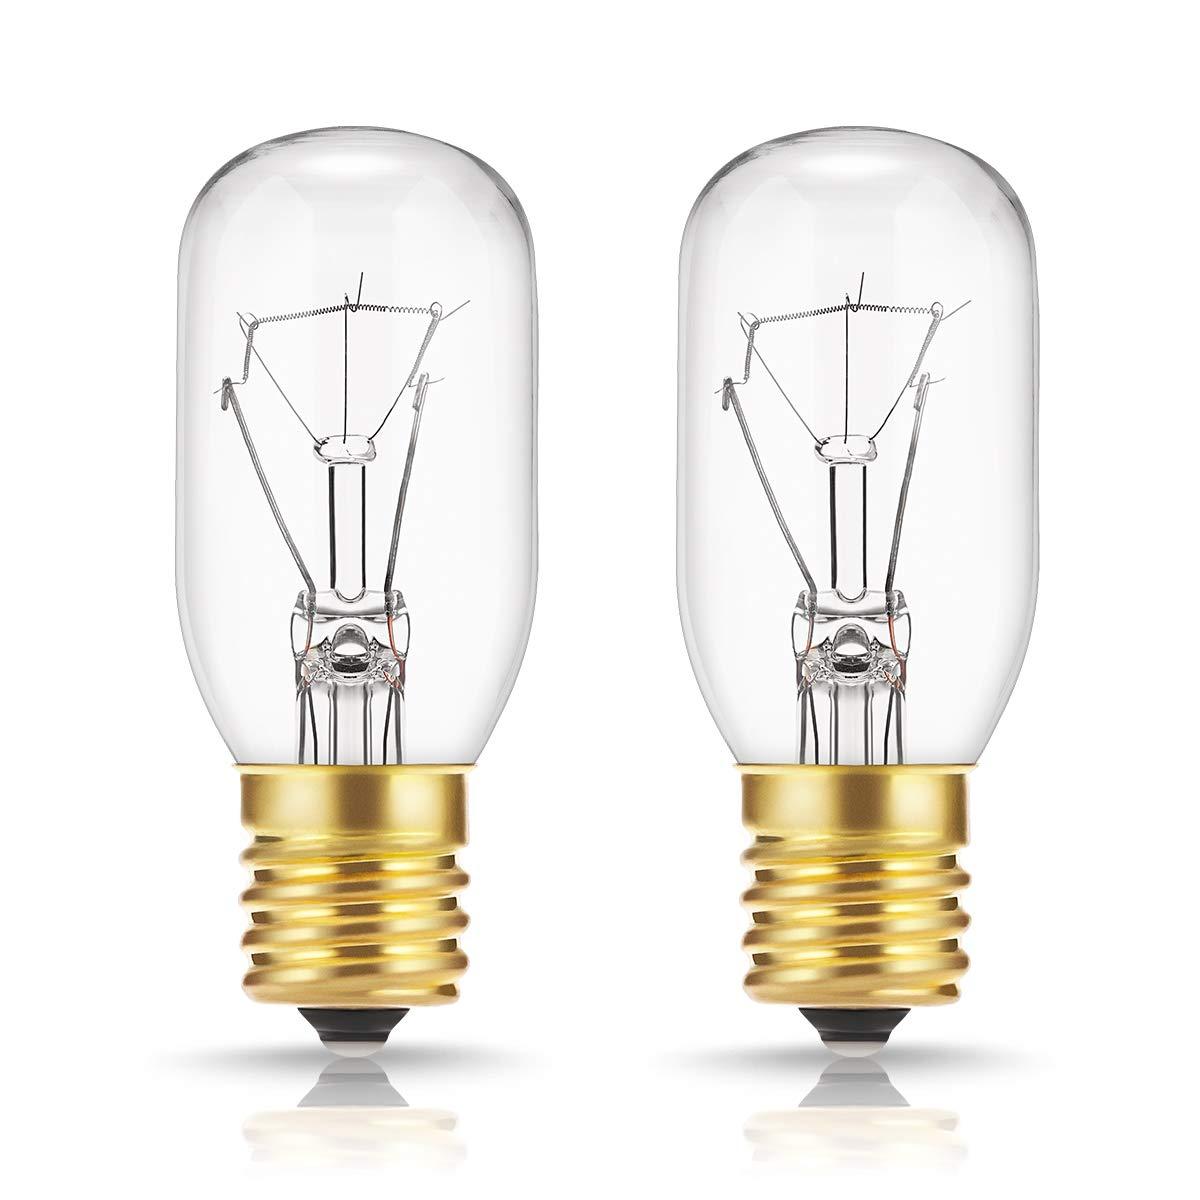 40 Watt Appliance Light Bulb, DORESshop T8 Tubular Incandescent Light Bulbs, Microwave Oven Replacement Bulb, E17 Indicator Intermediate Base, Dimmable, Warm Whte Glow, 2Pack